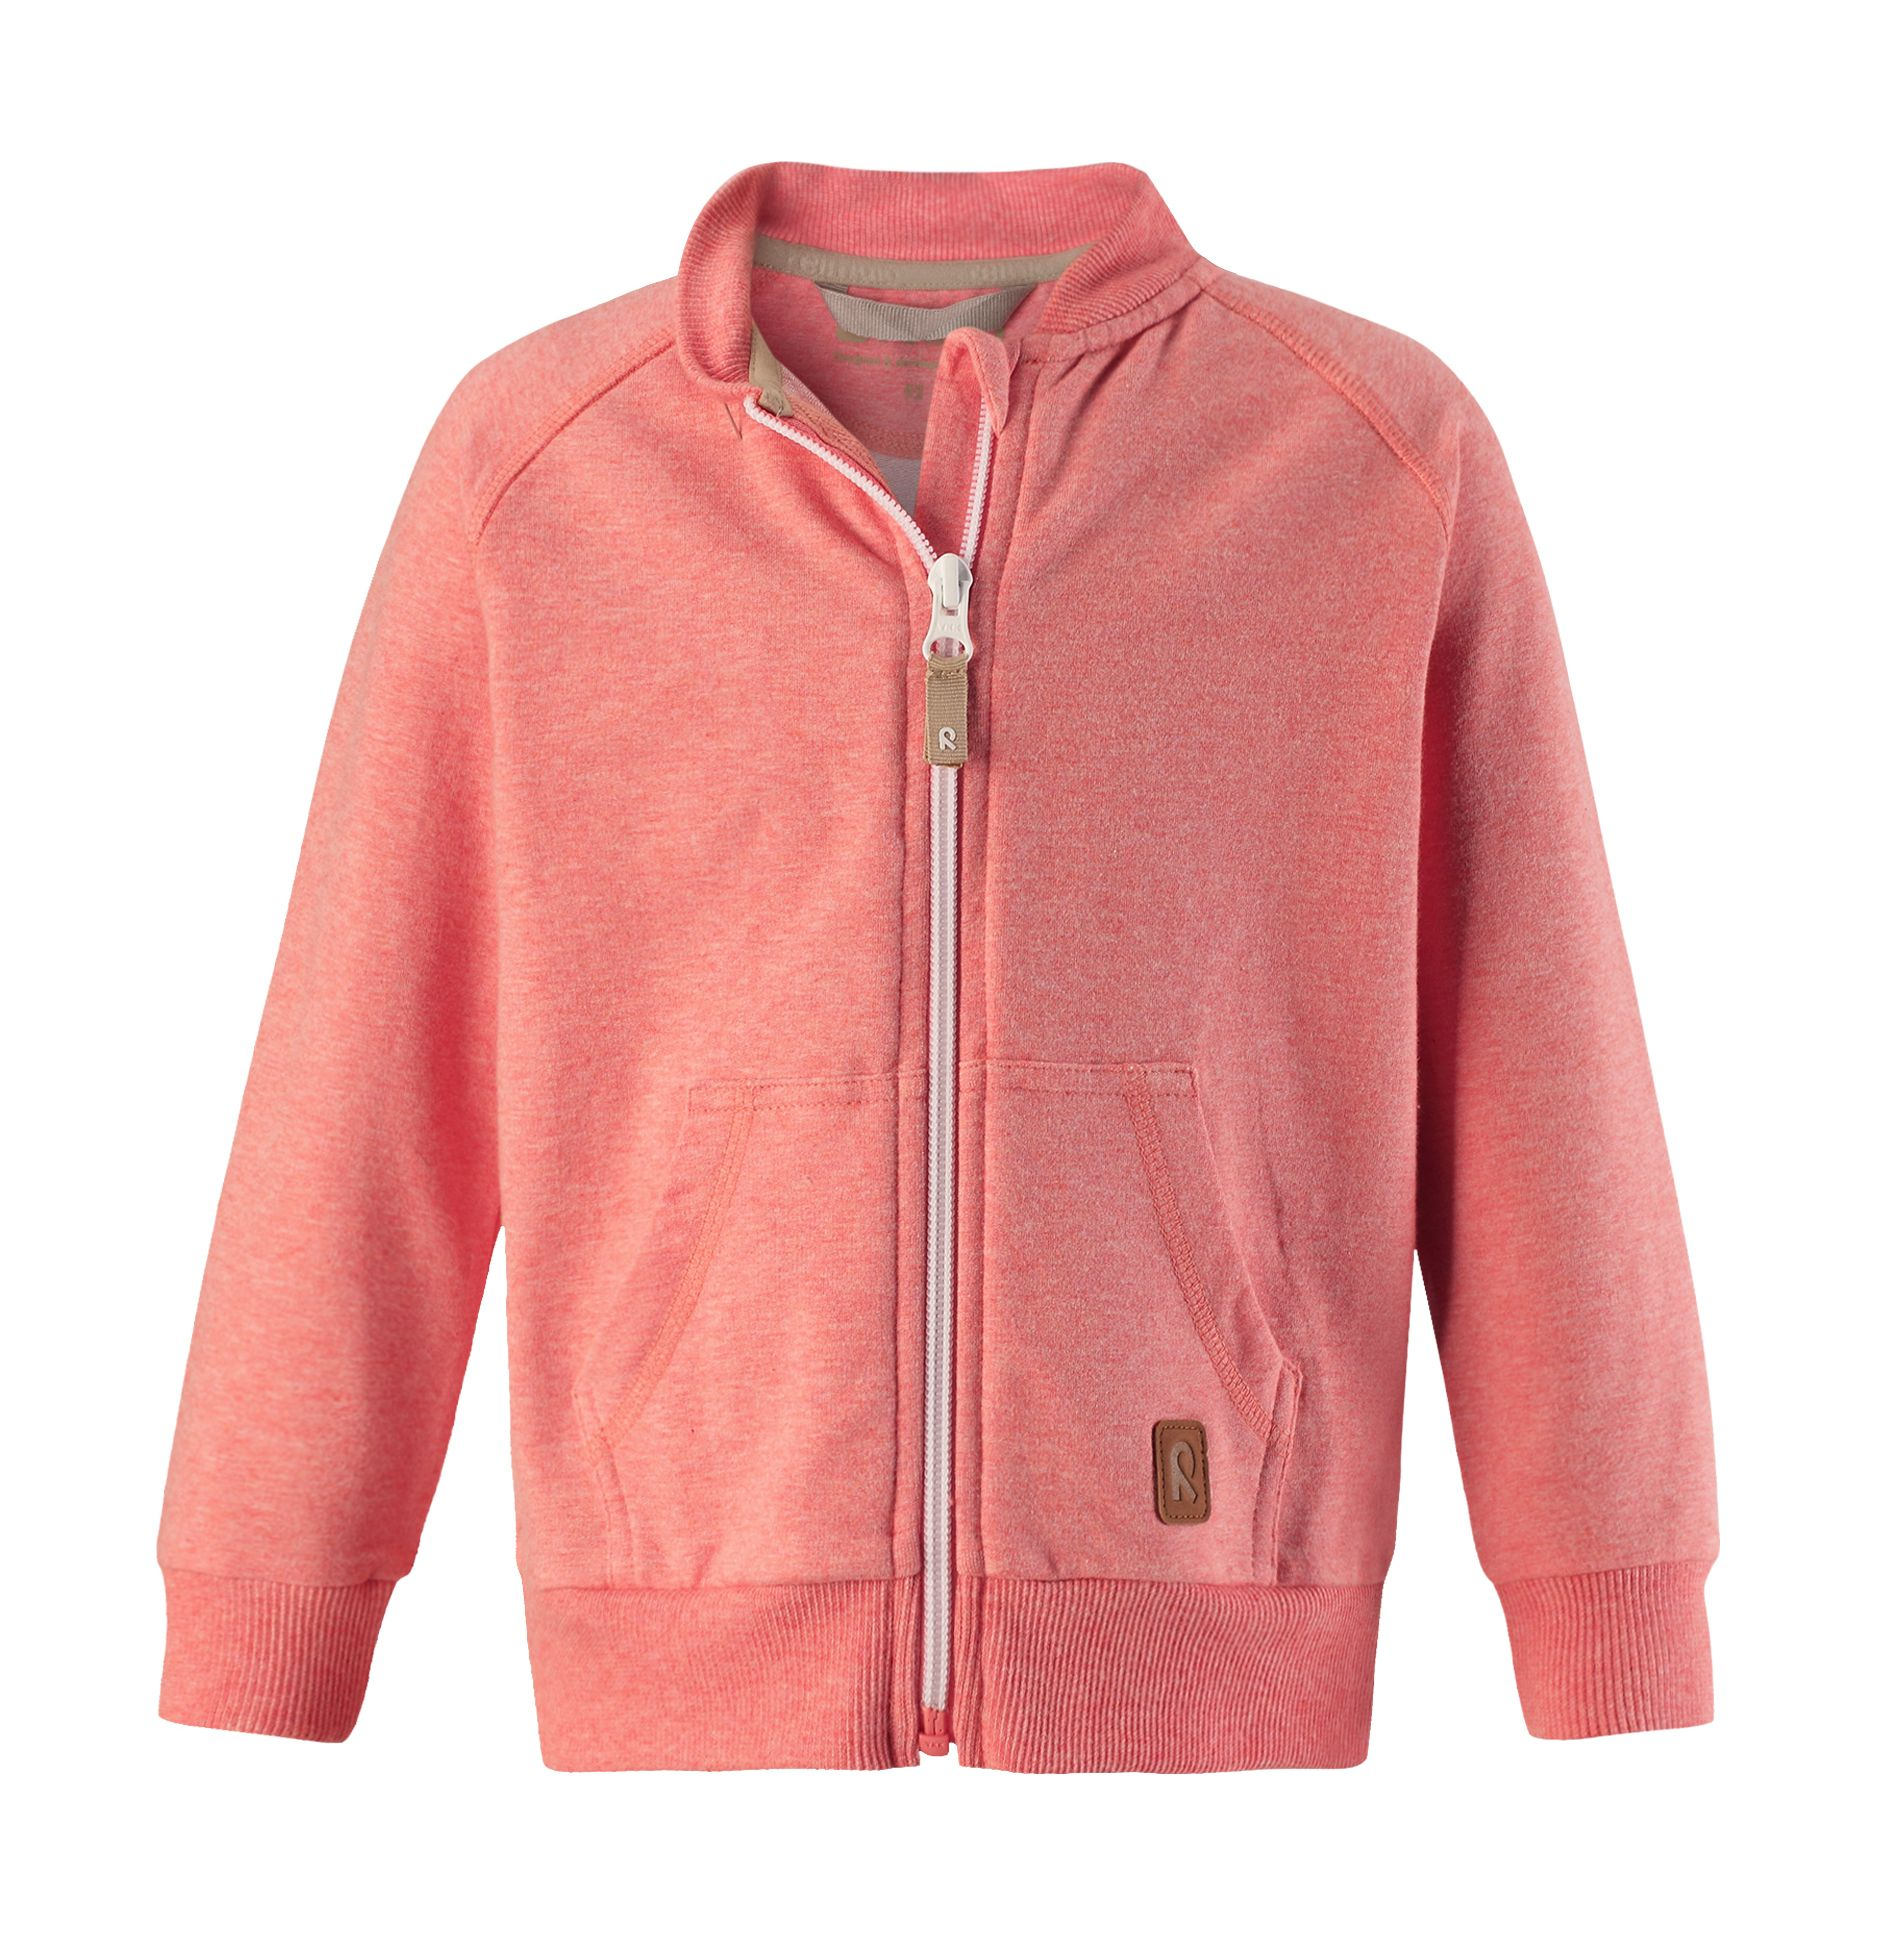 REIMA Toutain Coral Pink 110